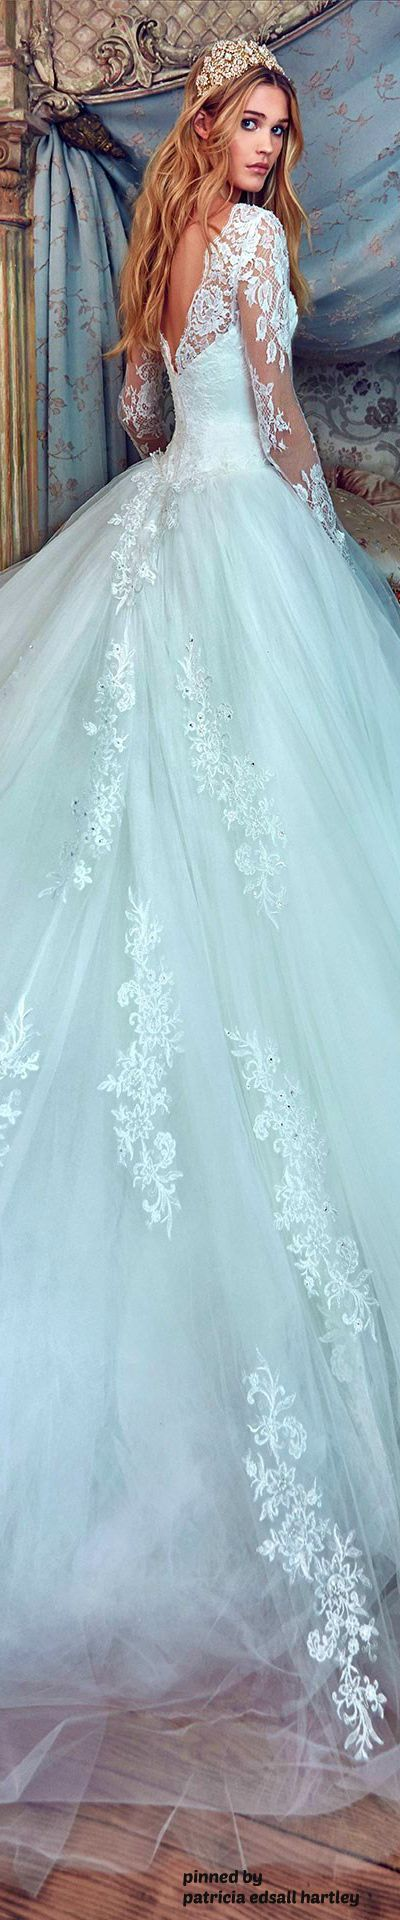 gorgeous wedding dress | [Inspiration] Princess Wedding | Pinterest ...